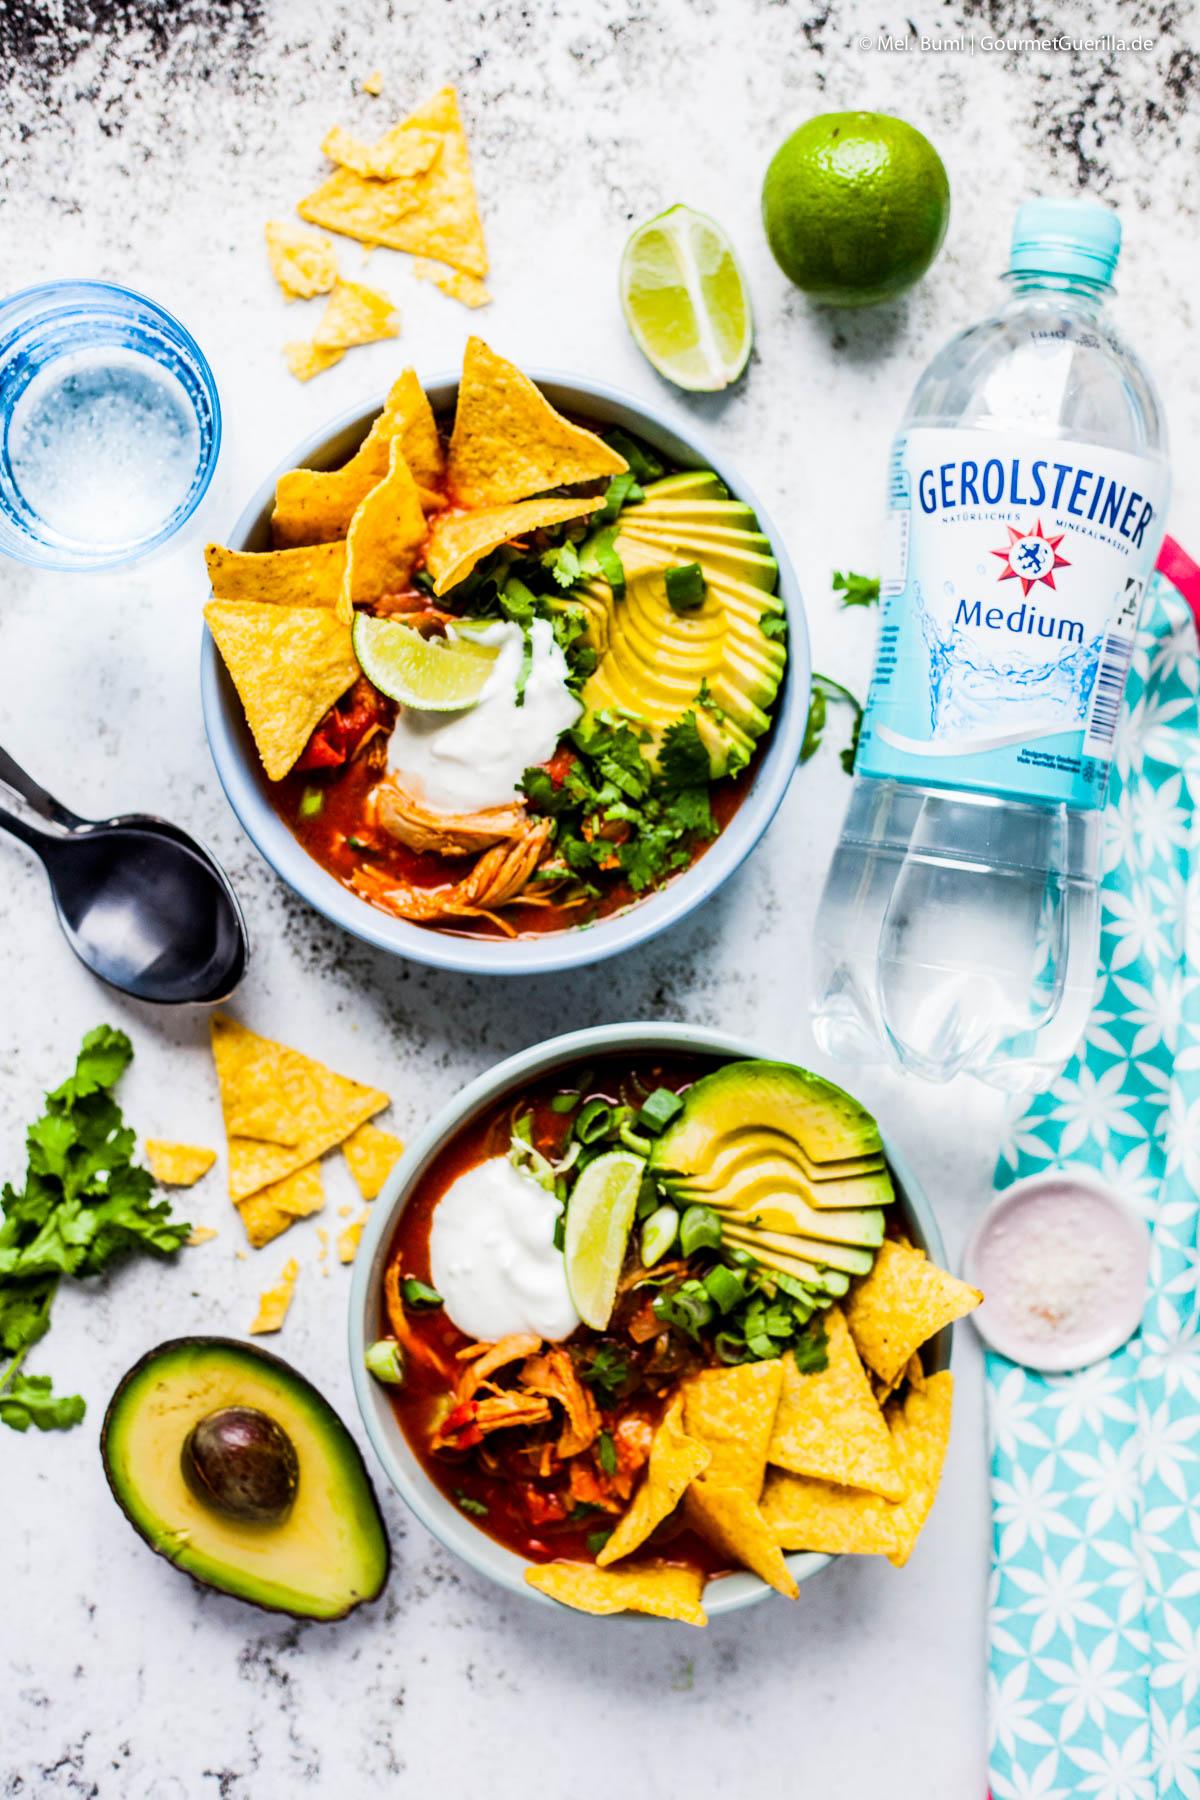 Mexikanische Tortilla-Suppe mit Avocado und Chipotle |GourmetGuerilla.de